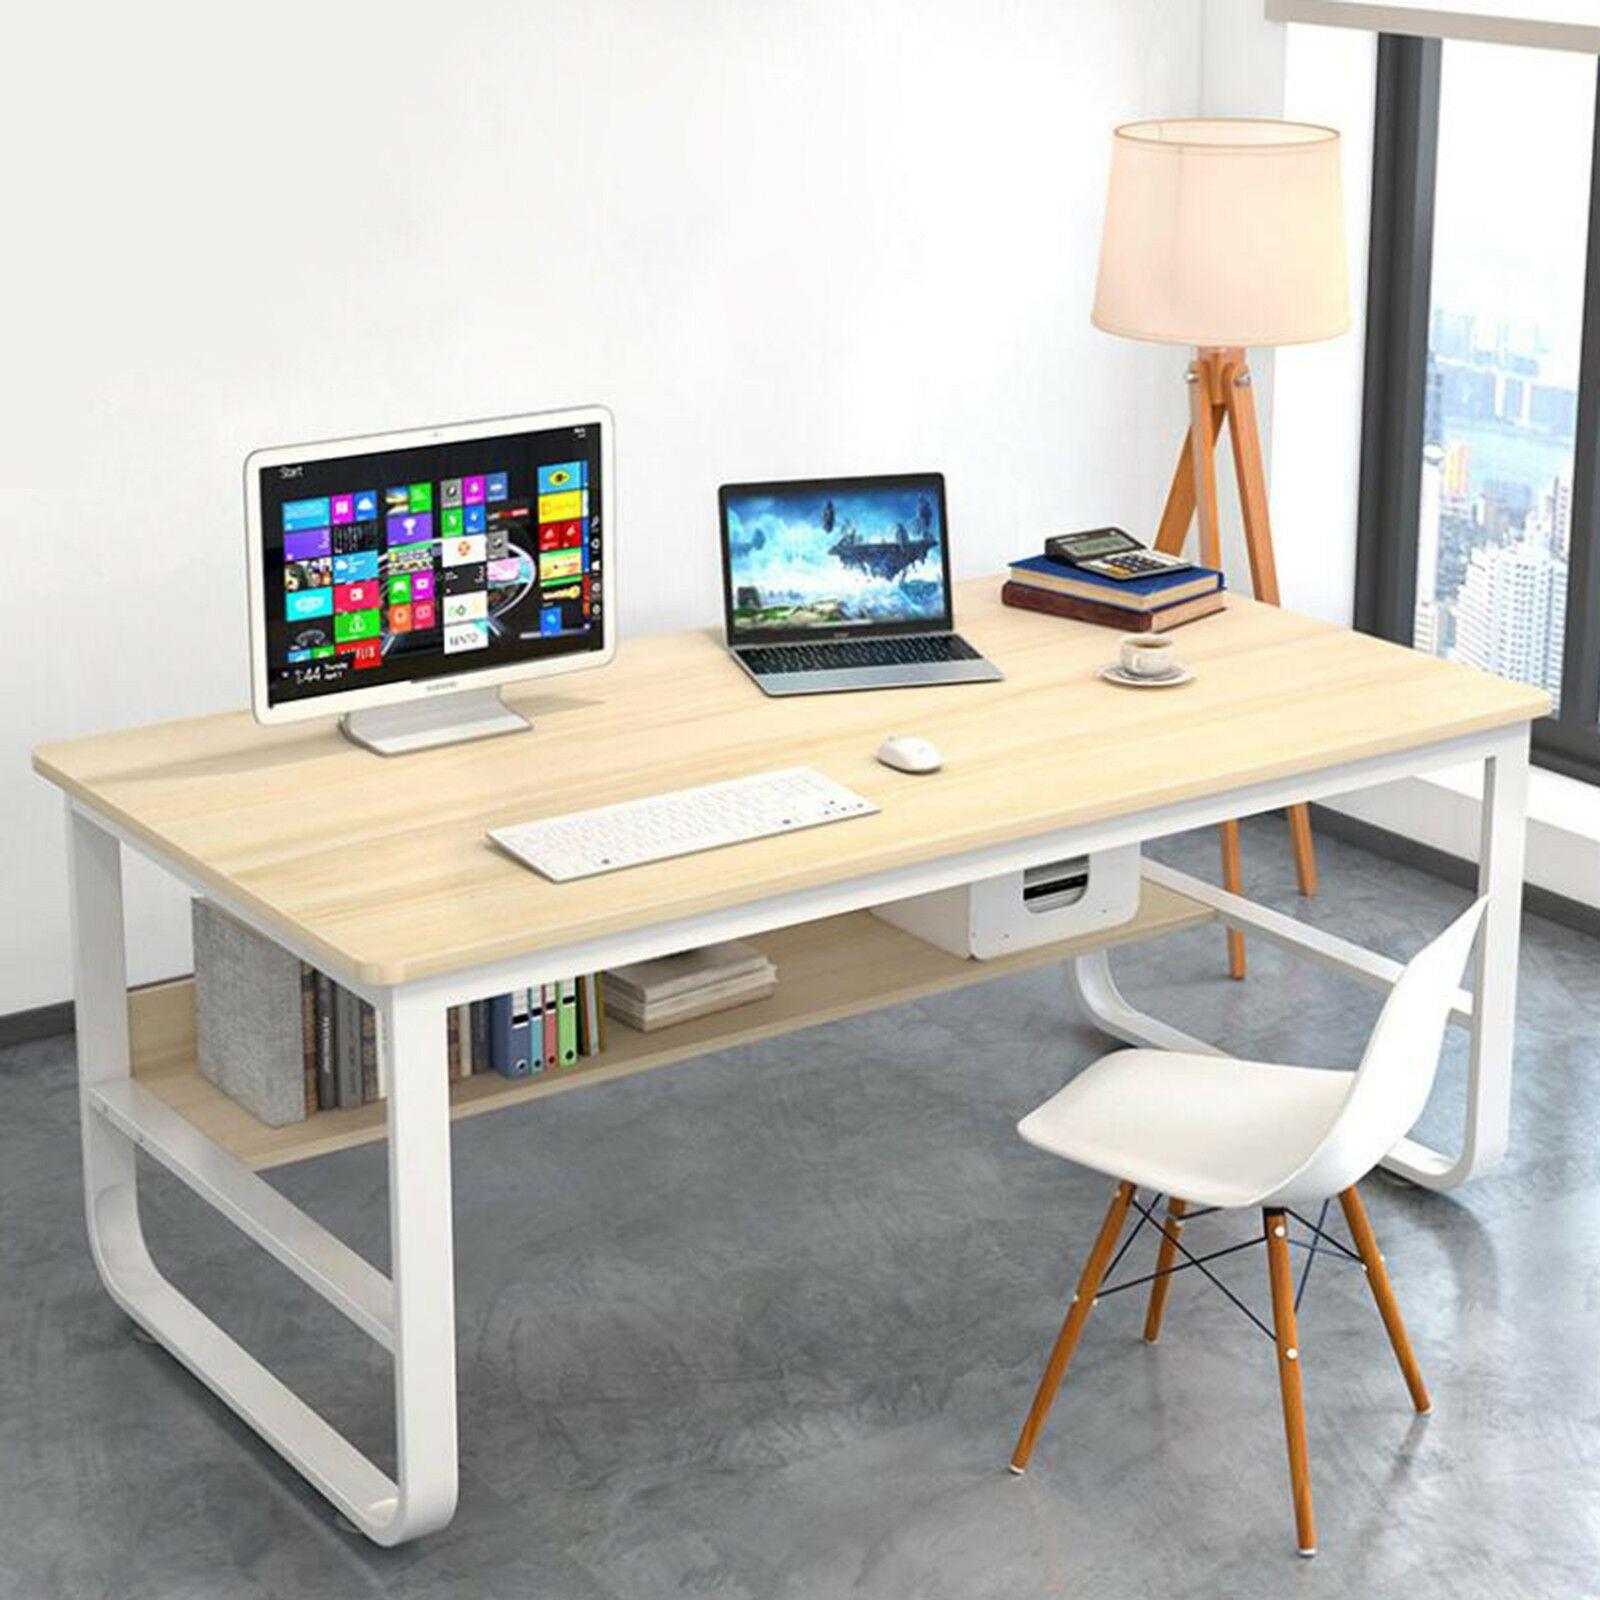 Computer Desk Laptop Pc Bookshelf Table Workstation Office Home